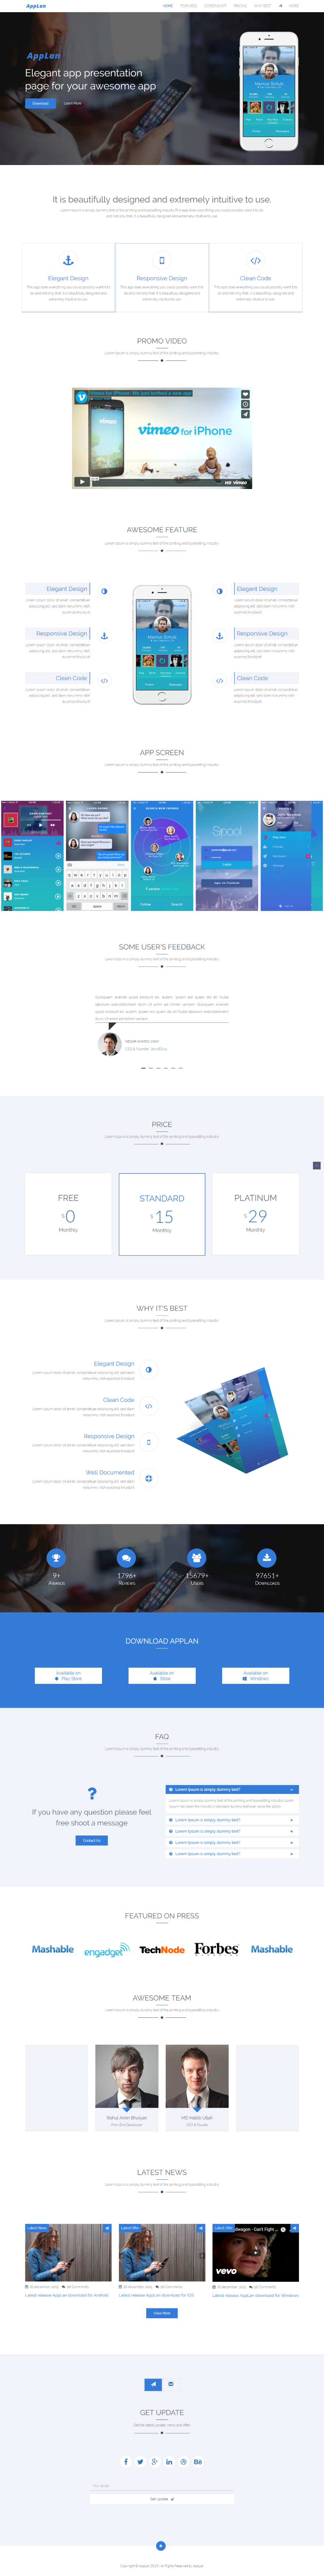 applan - free elegant app presentation html template - graphicarmy, Presentation templates